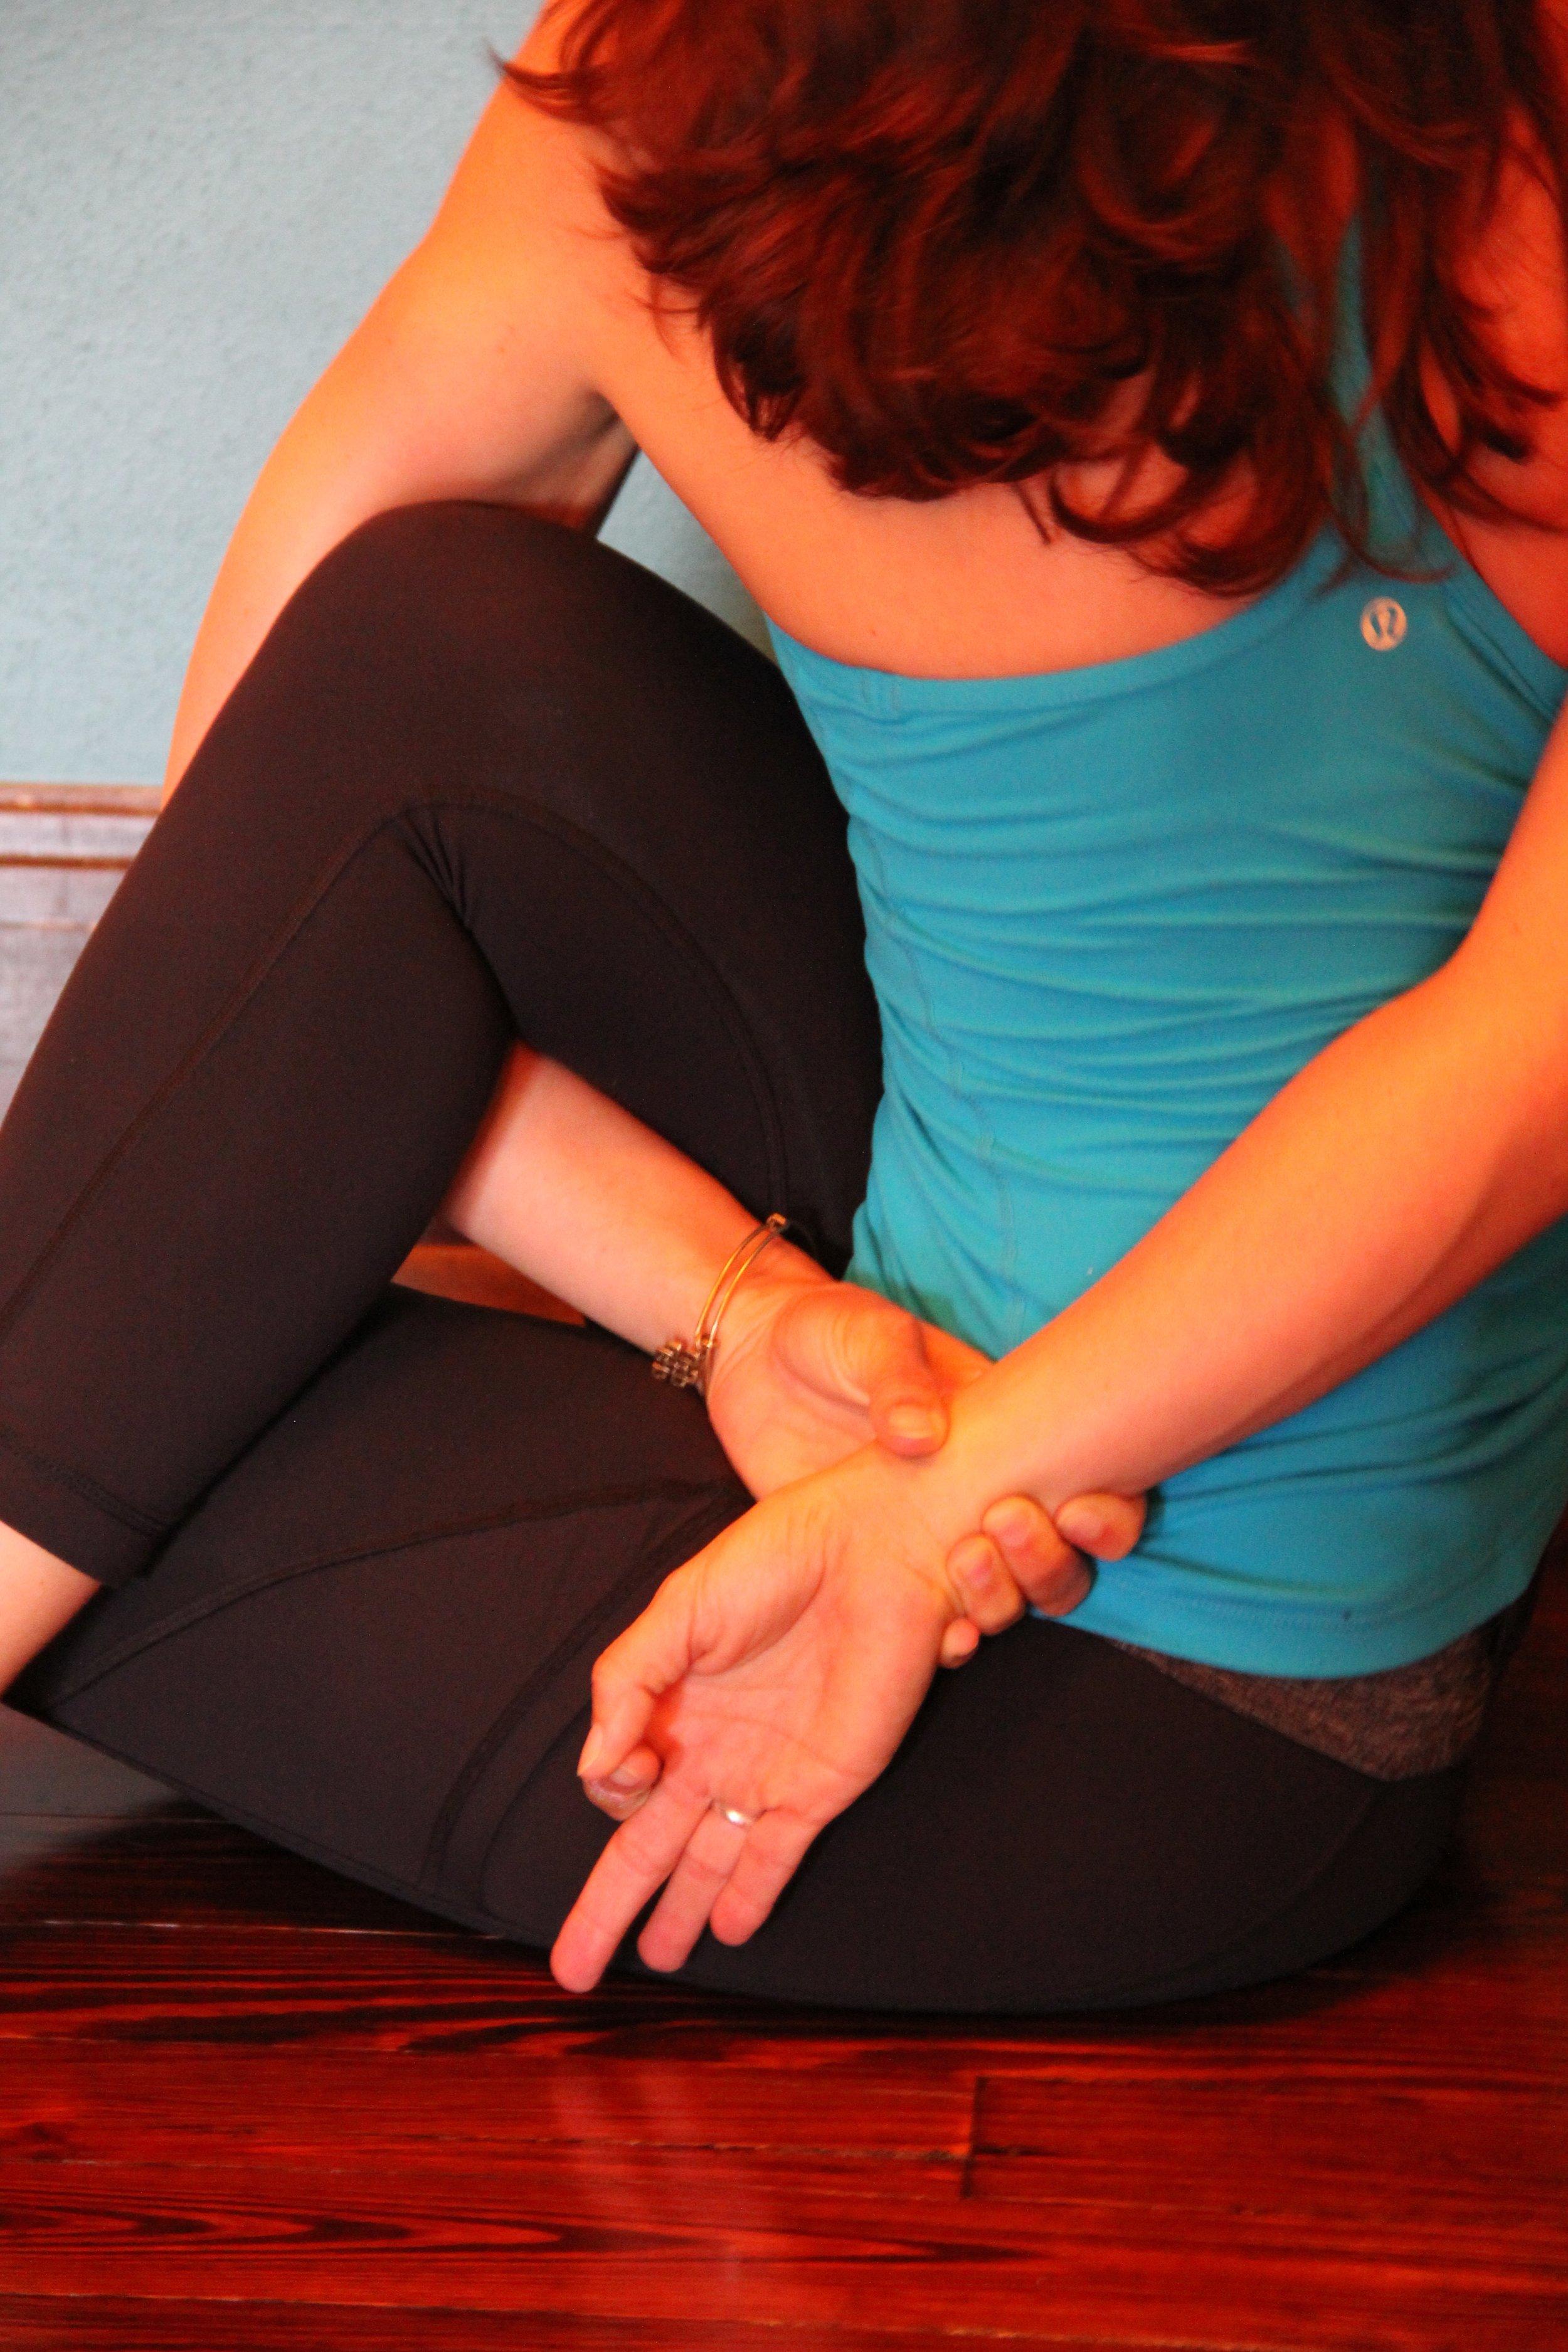 Chelle Yoga Twist.jpg